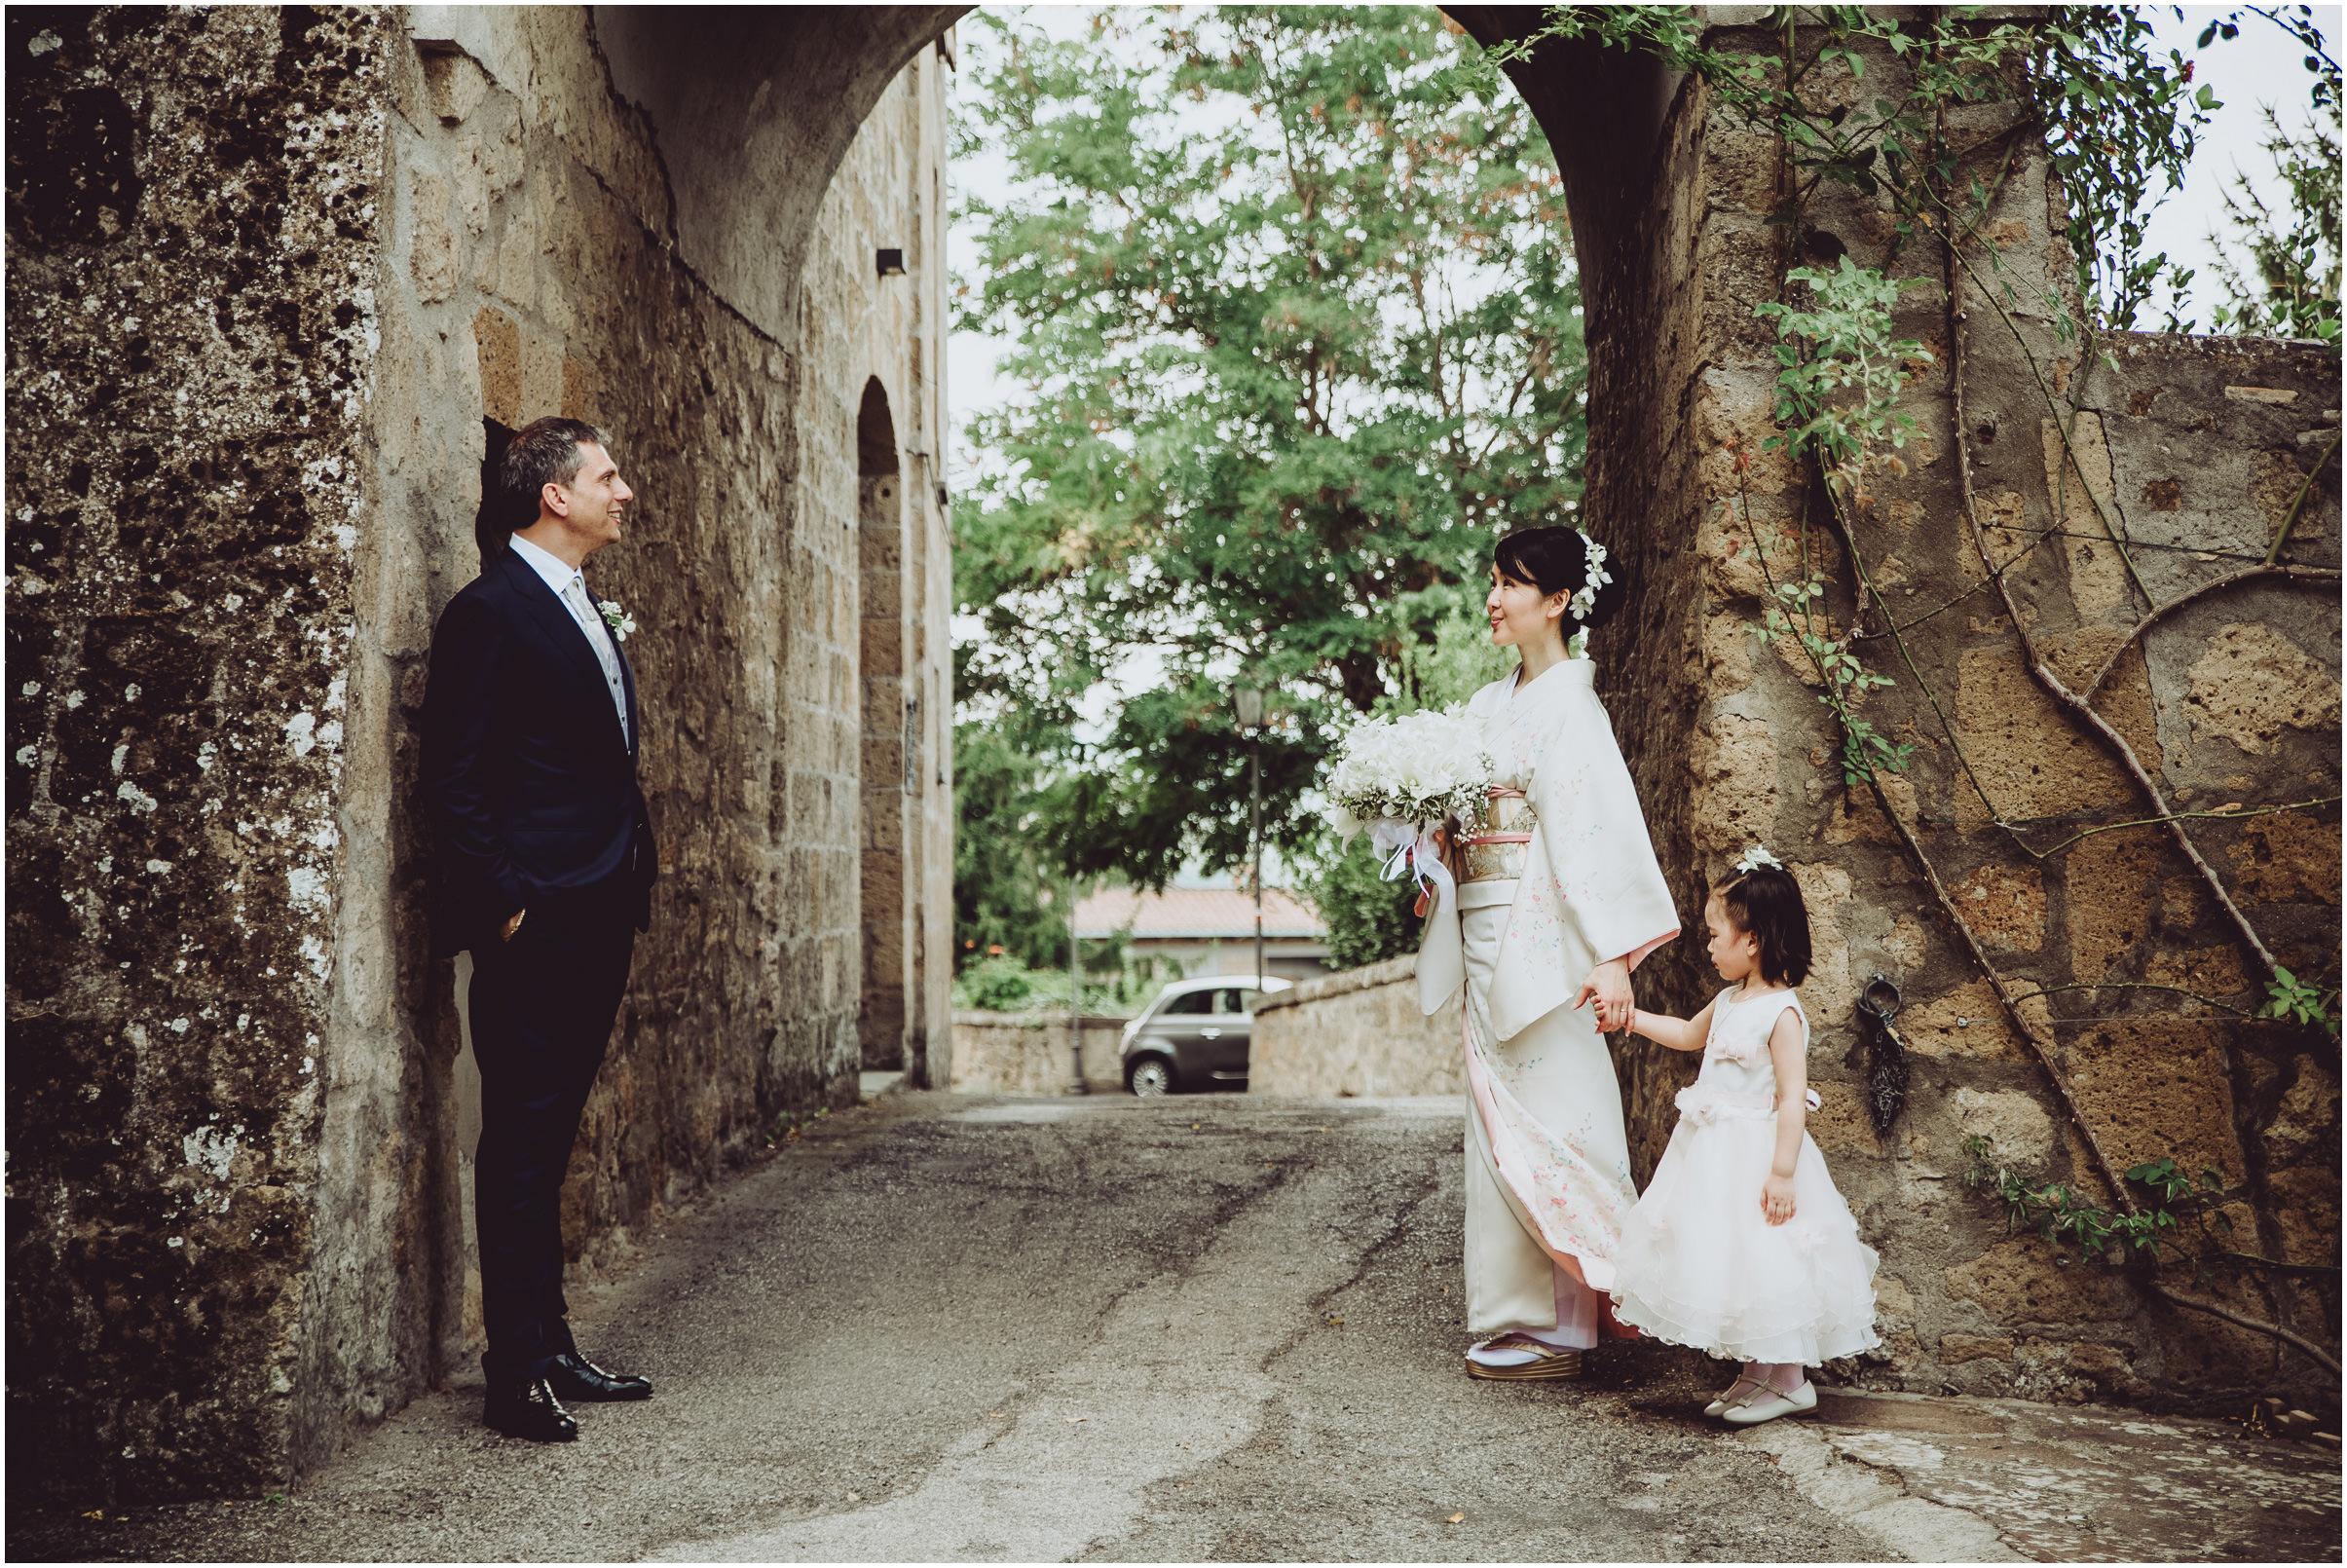 WEDDING-PHOTOGRAPHY-SARA-LORENZONI-FOTOGRAFIA-MATRIMONIO-ORVIETO-JUKA-ANTONELLO29